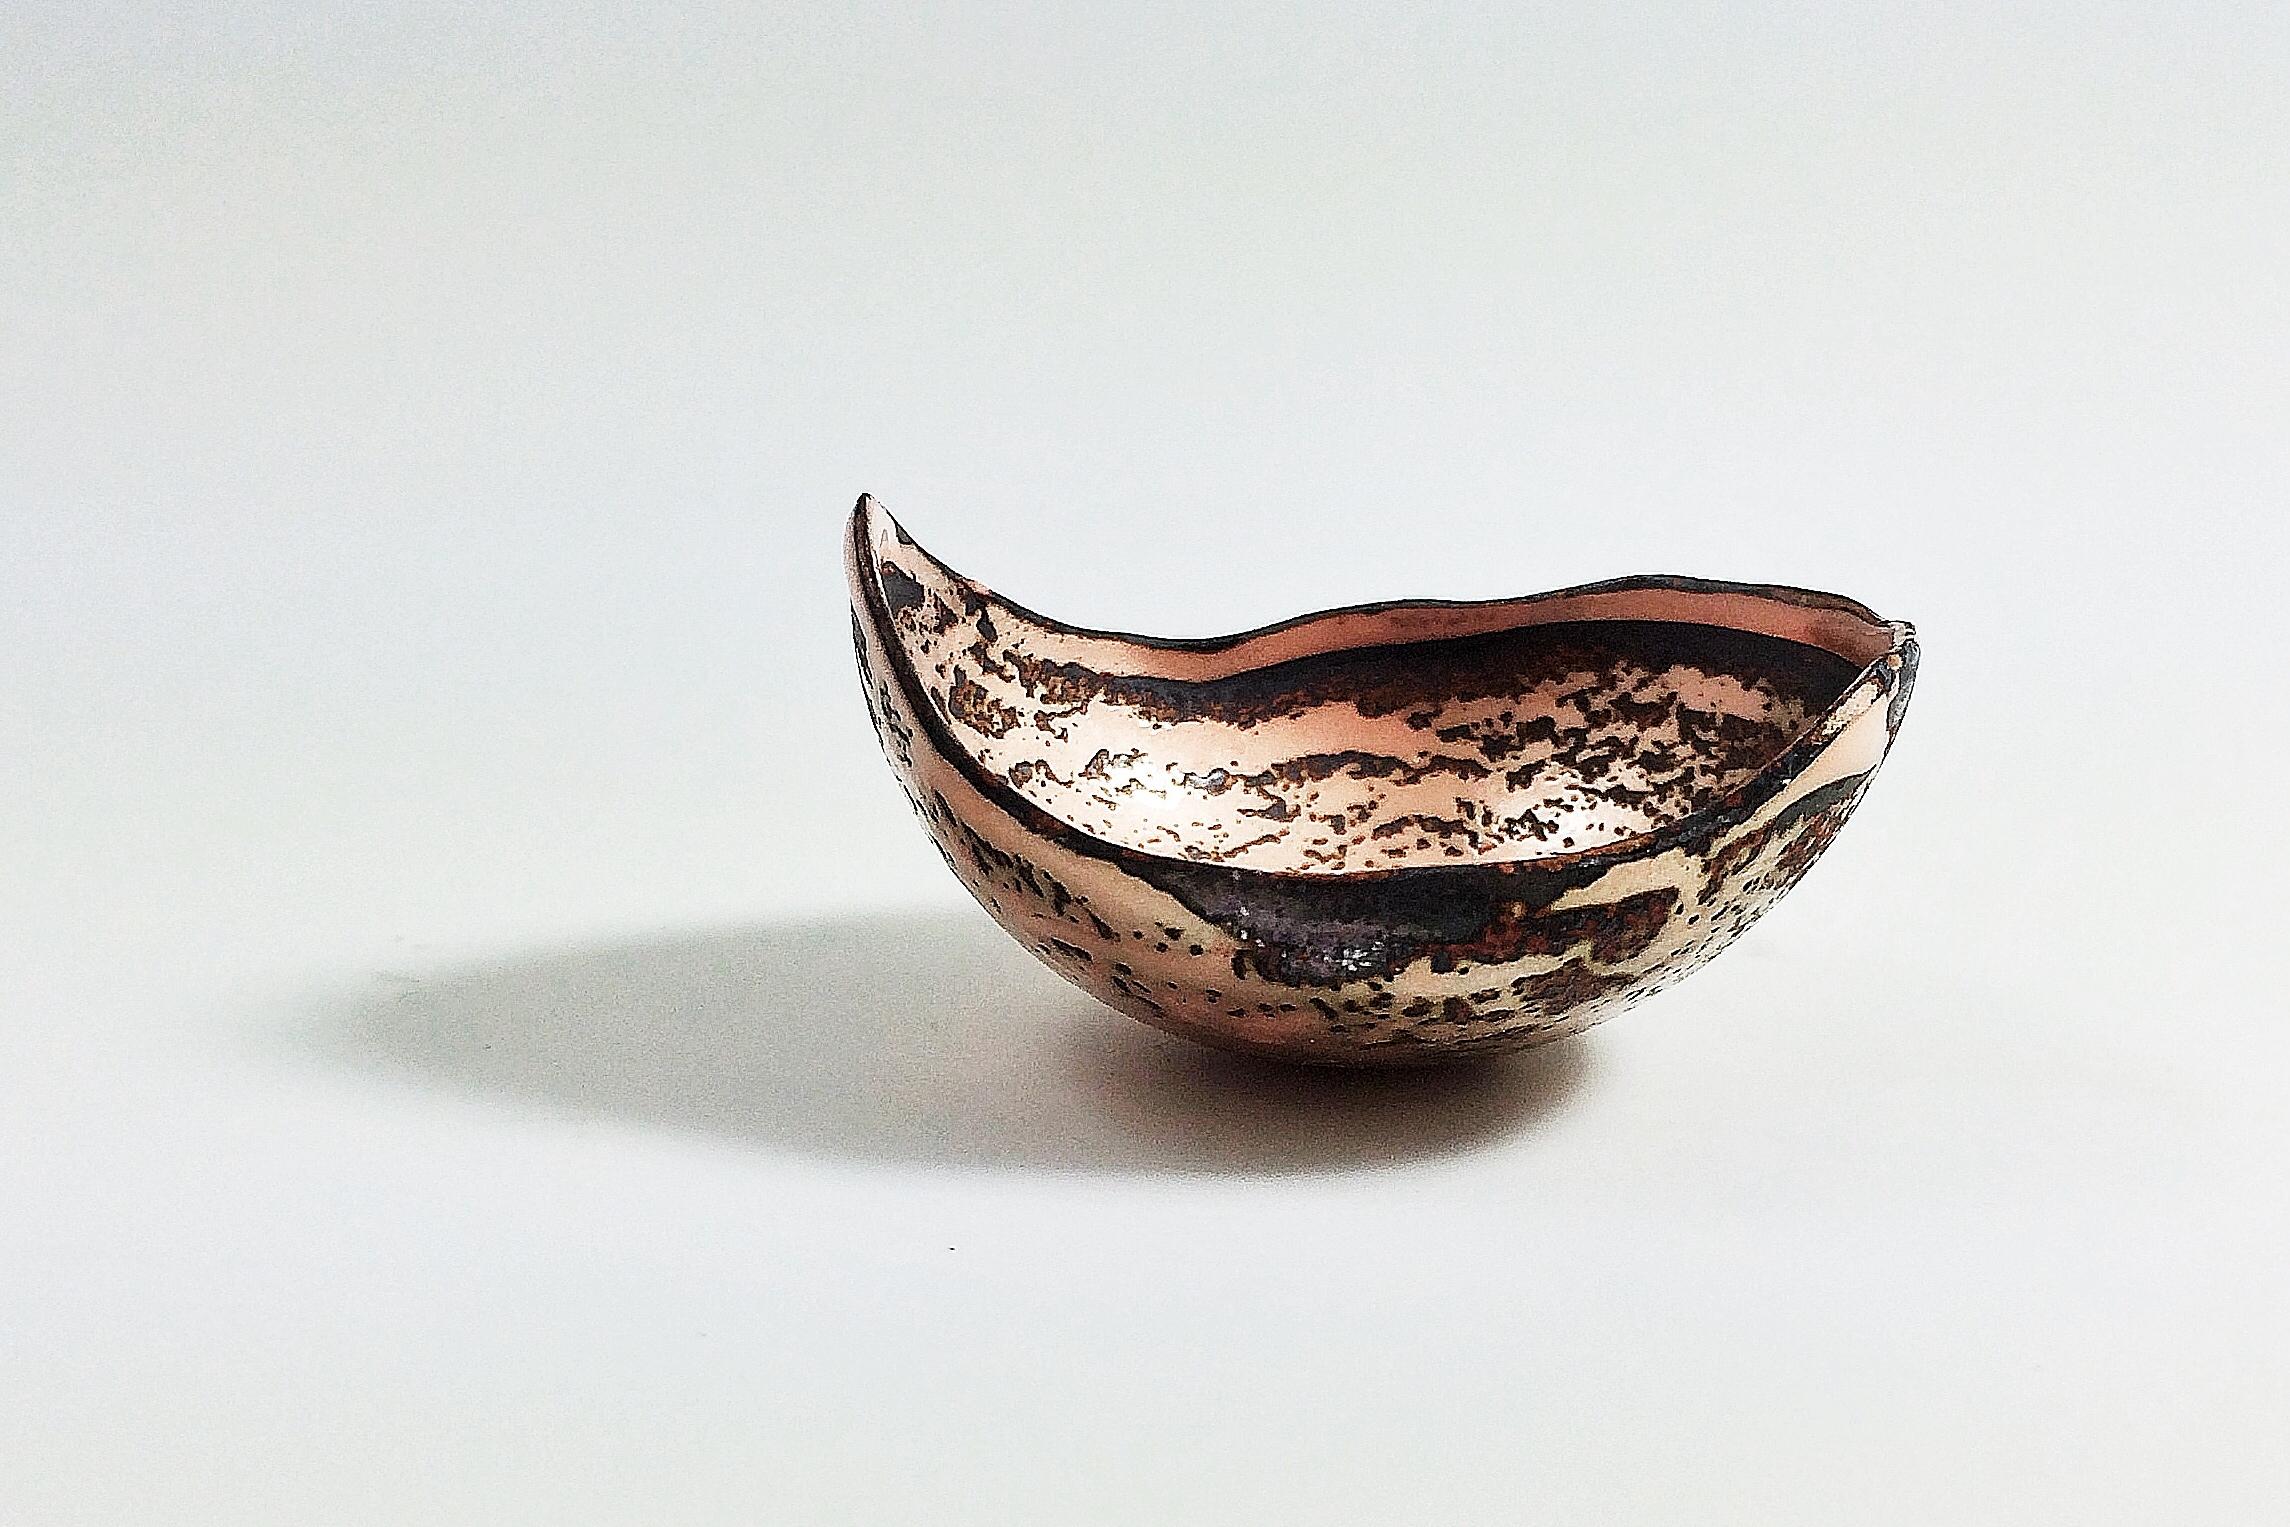 Receiving bowl #17 by Ginger Meek Allen